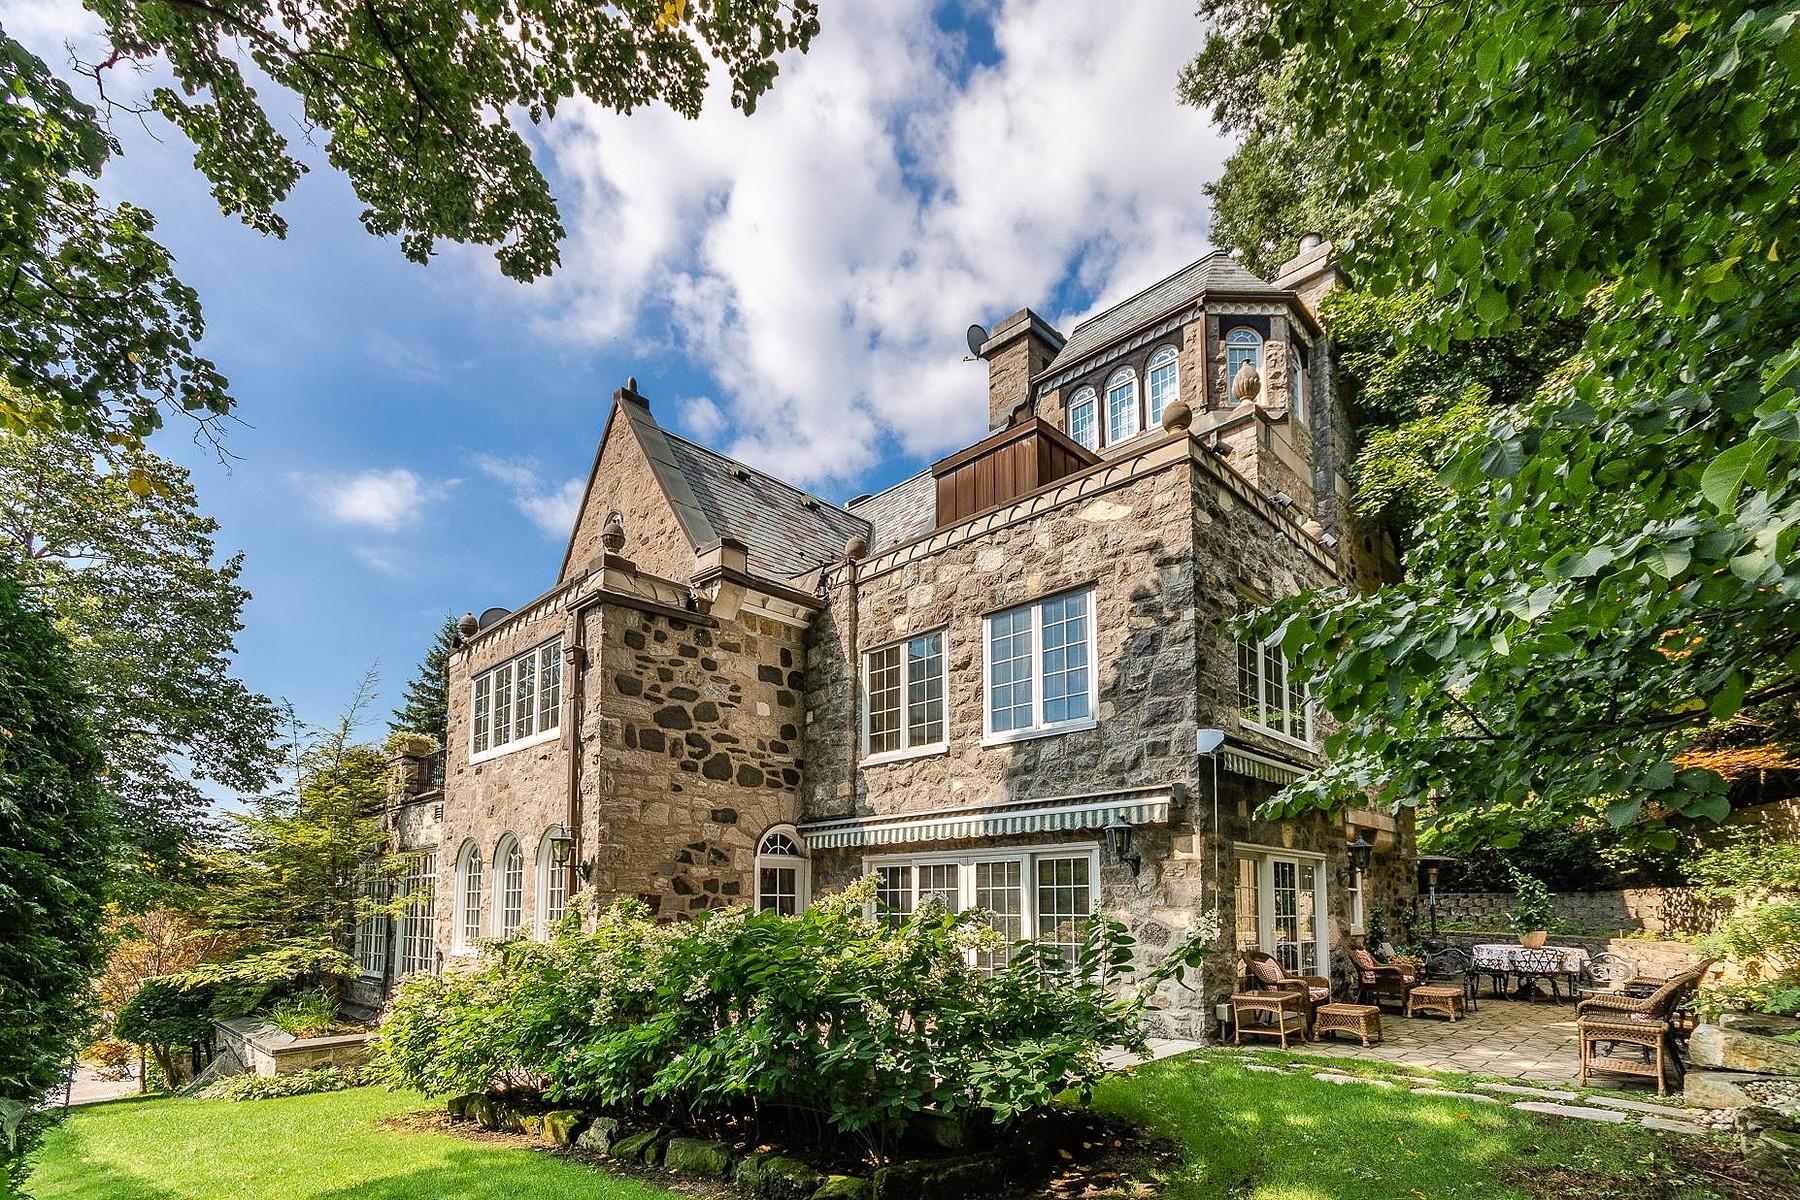 Single Family Homes for Sale at Westmount, Montréal 621 Av. Clarke Westmount, Quebec H3Y3E5 Canada